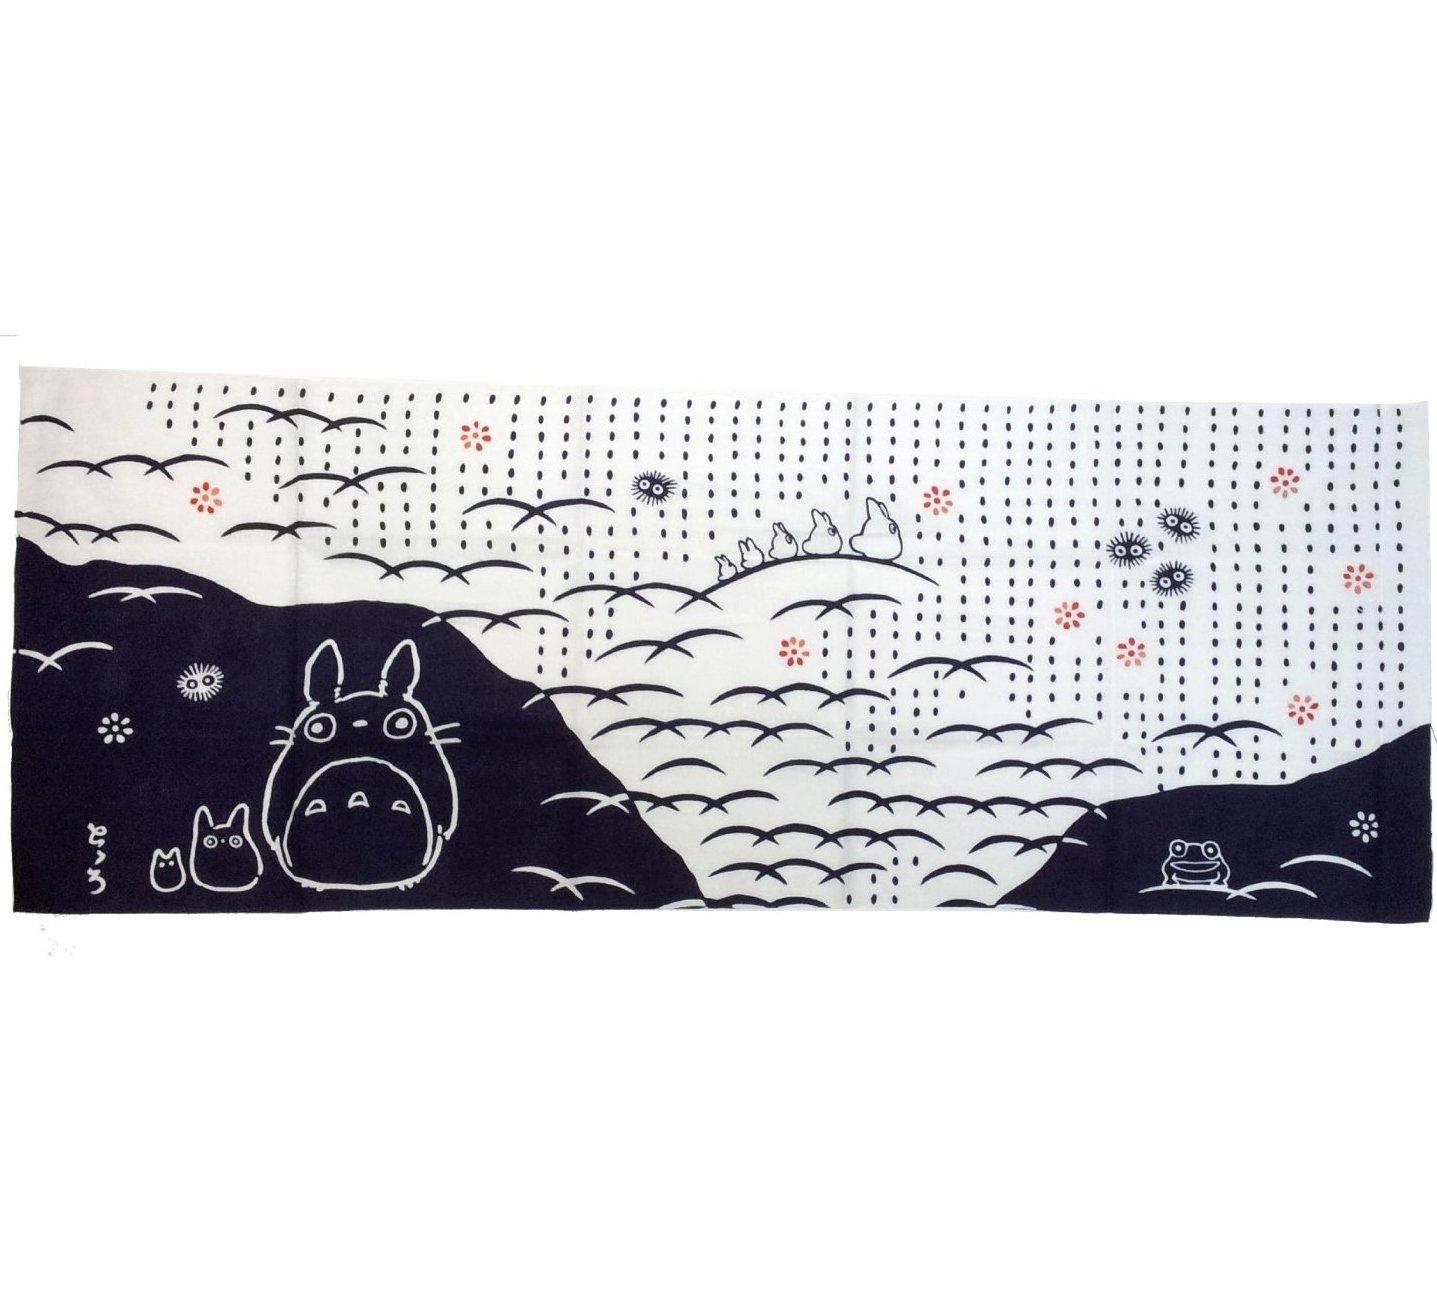 Towel / Tenugui - 33x90cm - Natsushiba - Japanese Dyed Made Japan Totoro Ghibli no production (new)